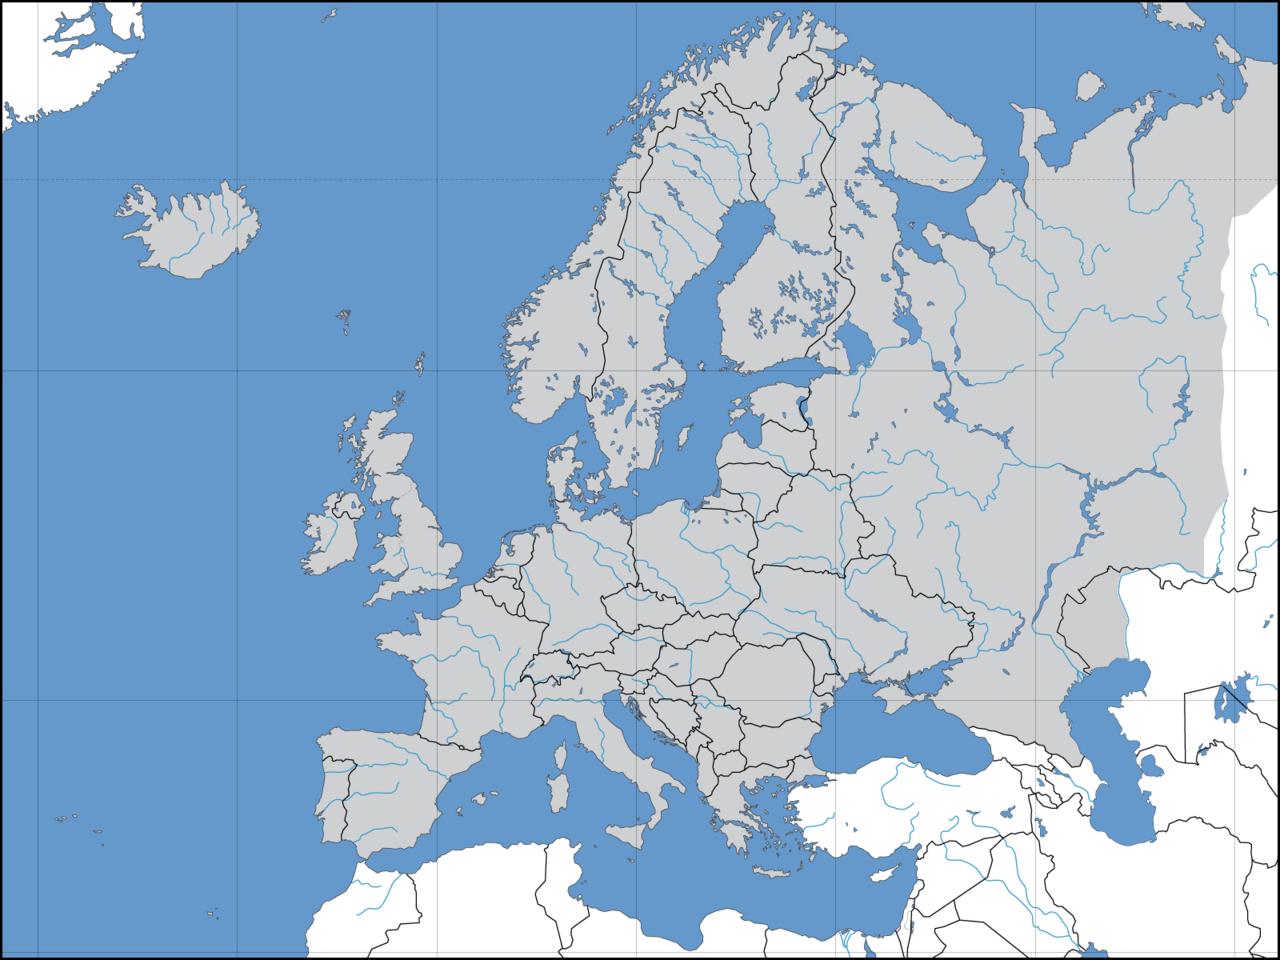 EEA Hope for Europe